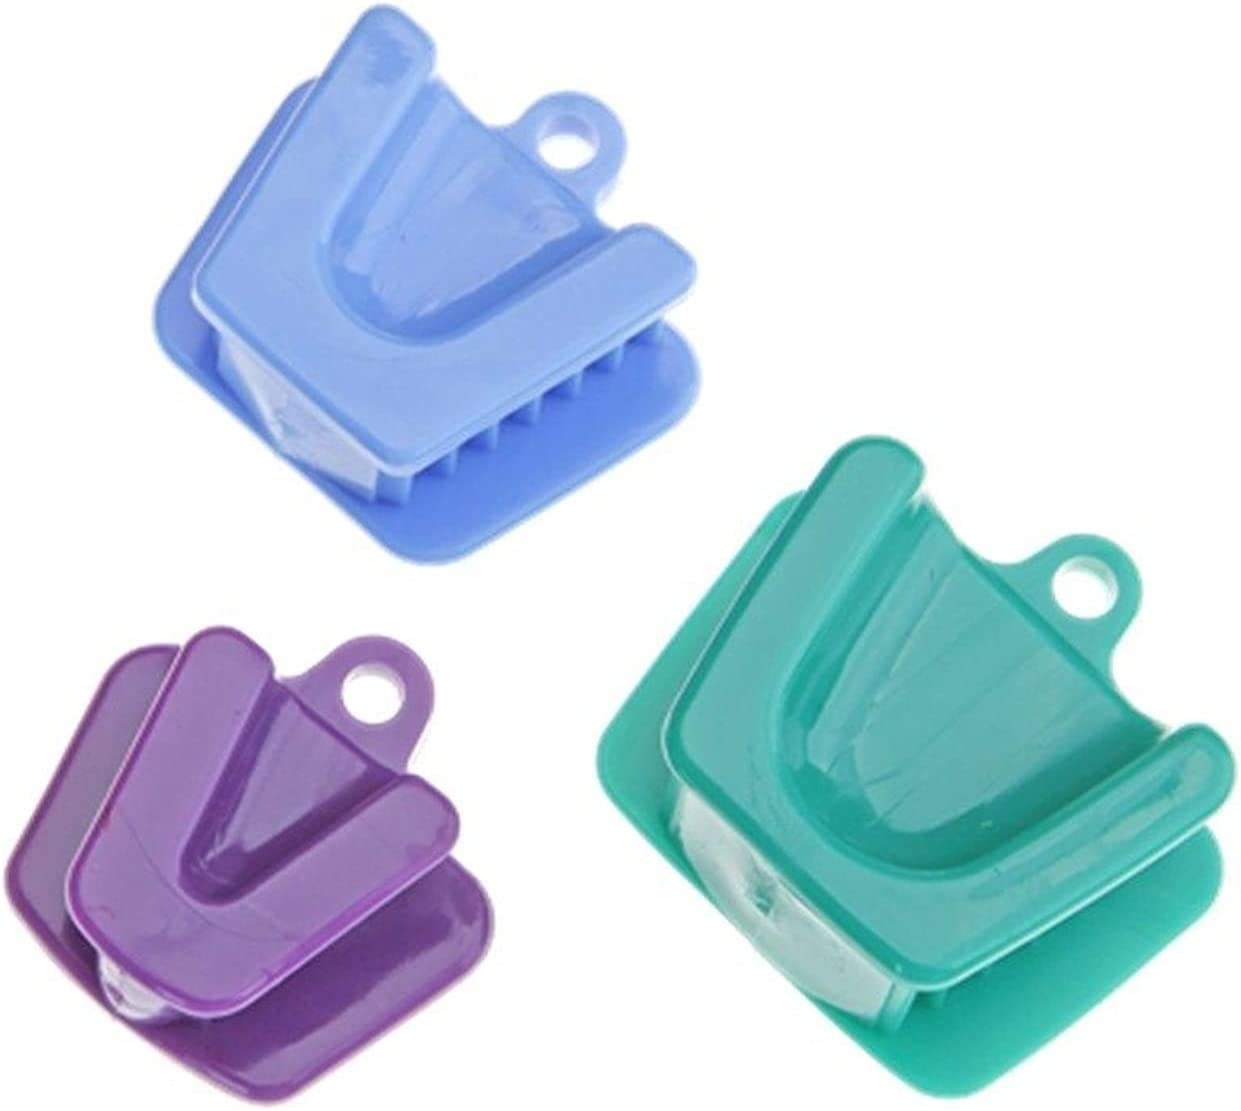 ZHANGM 3pcs Dental Mouth Prop New mail order Supply Cushion Colorado Springs Mall O Bite Block